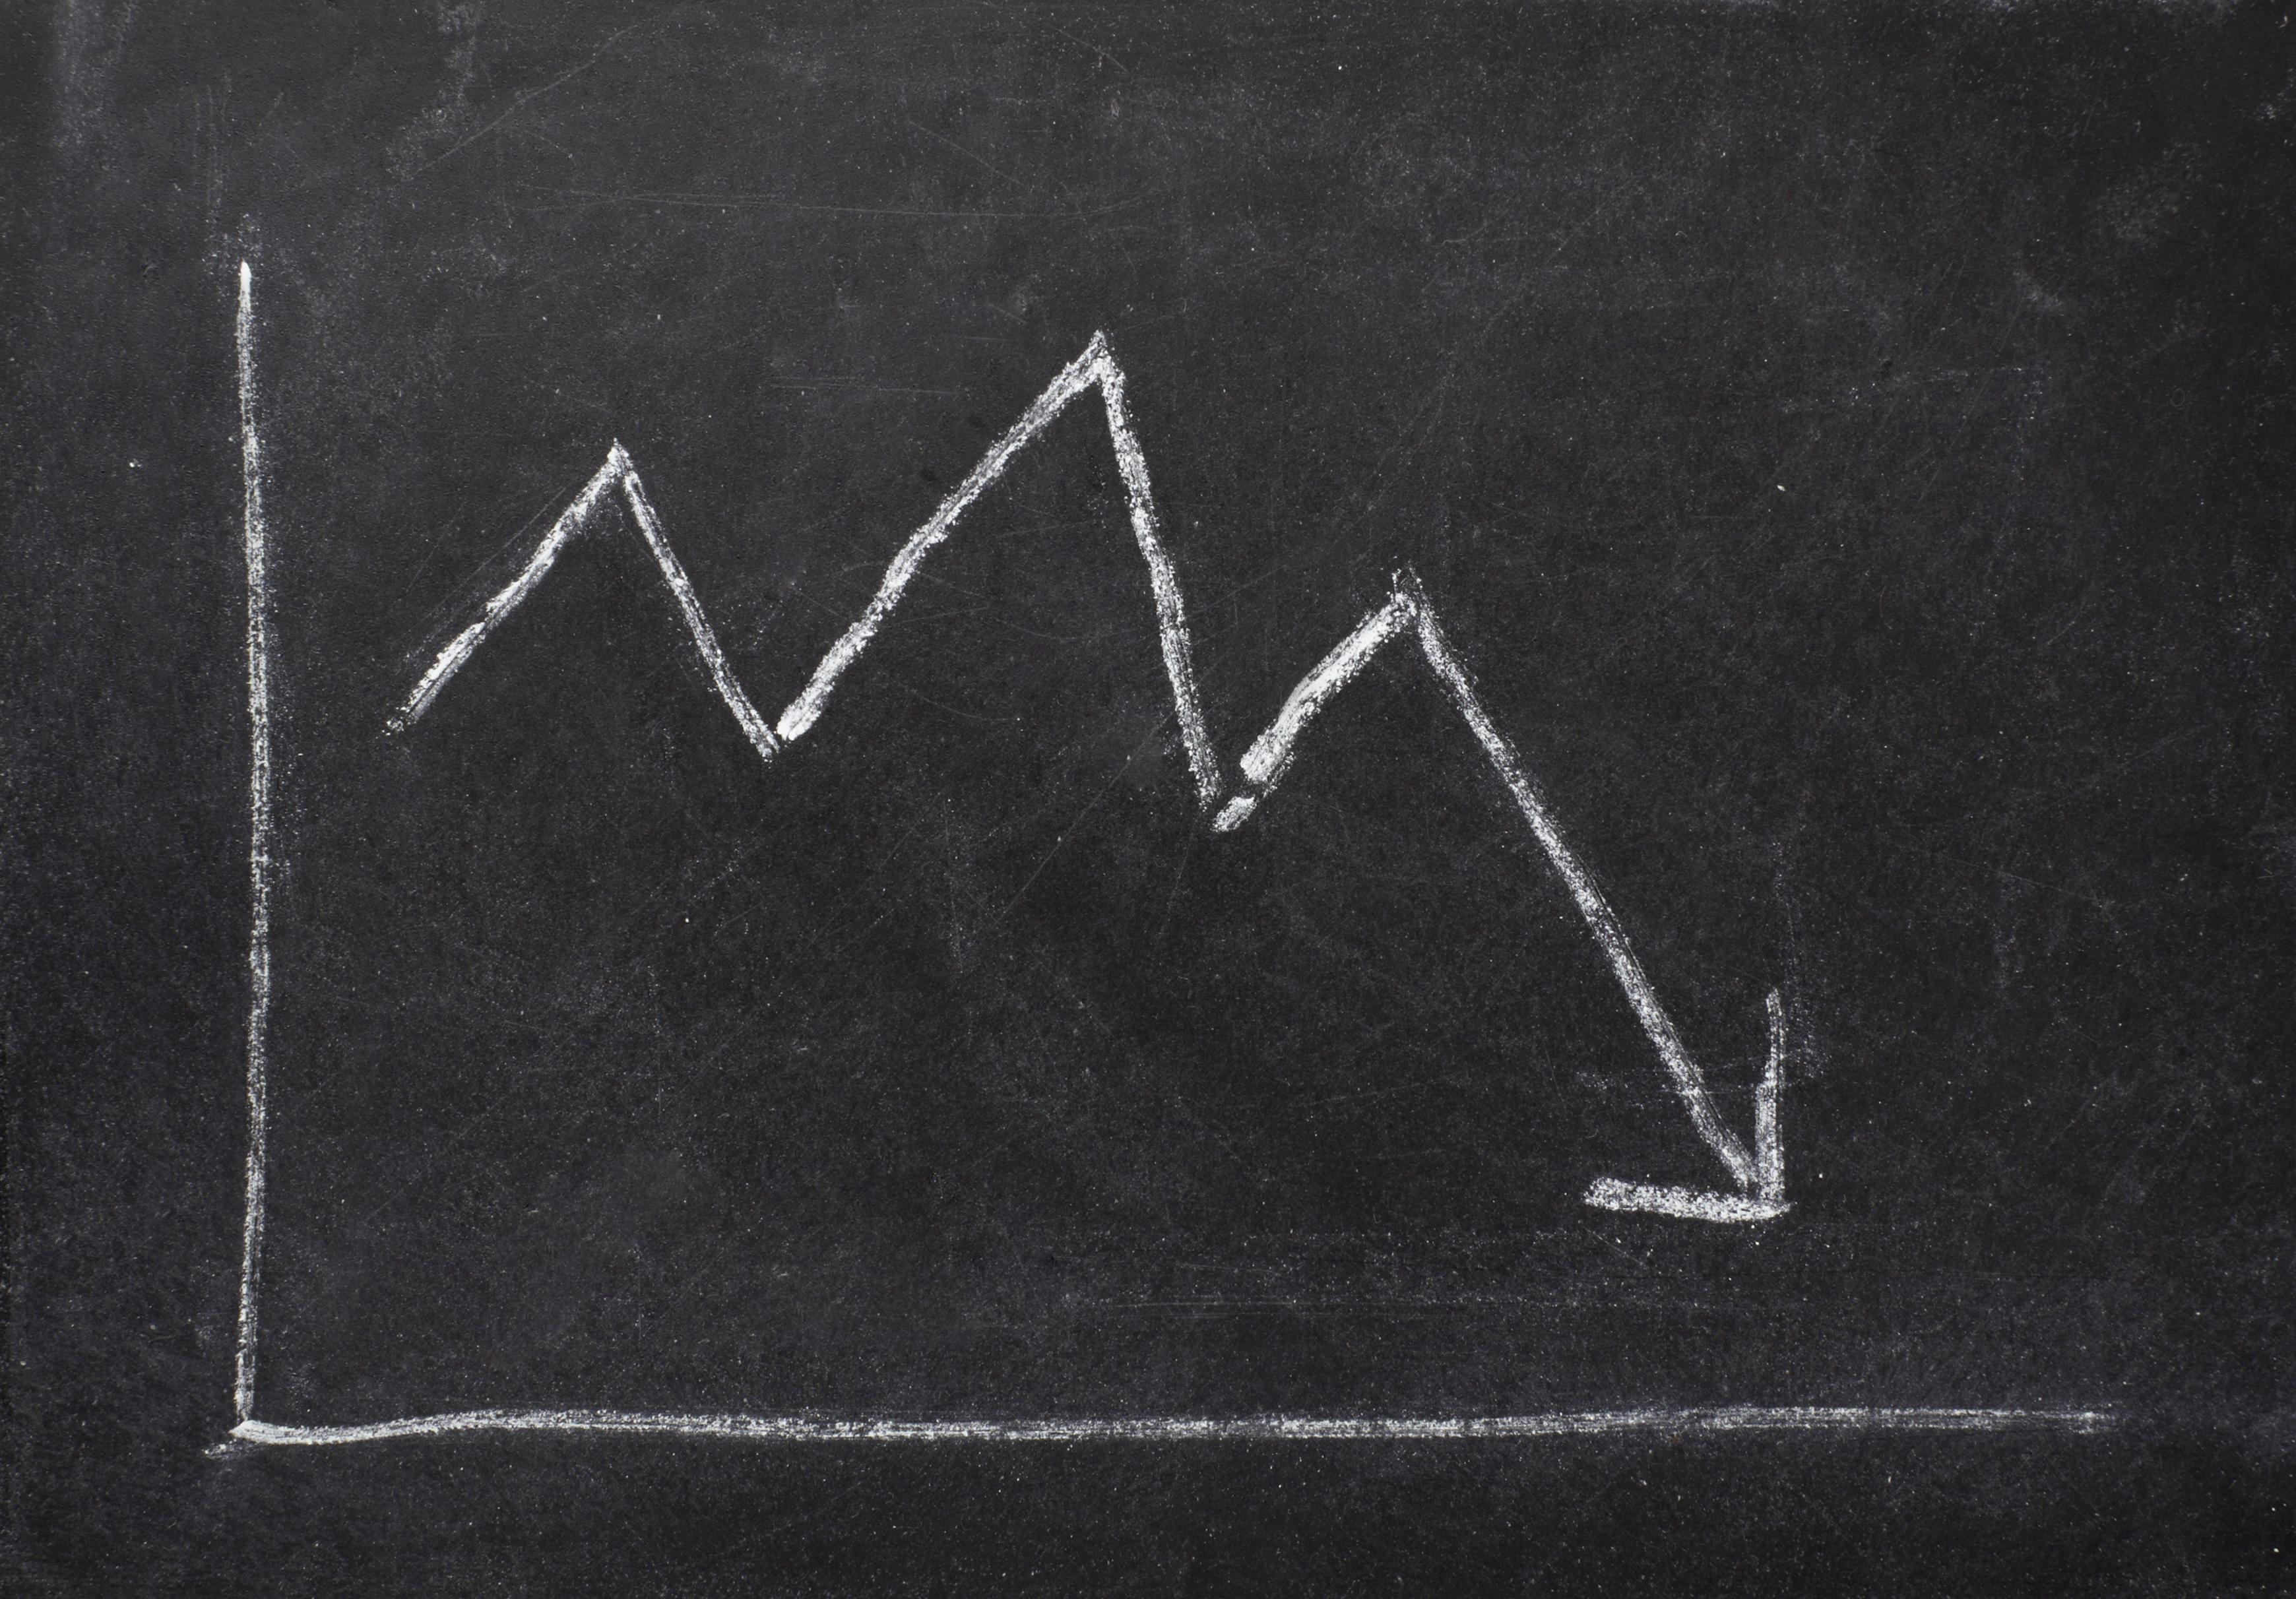 A downward trending graph drawn on a blackboard.